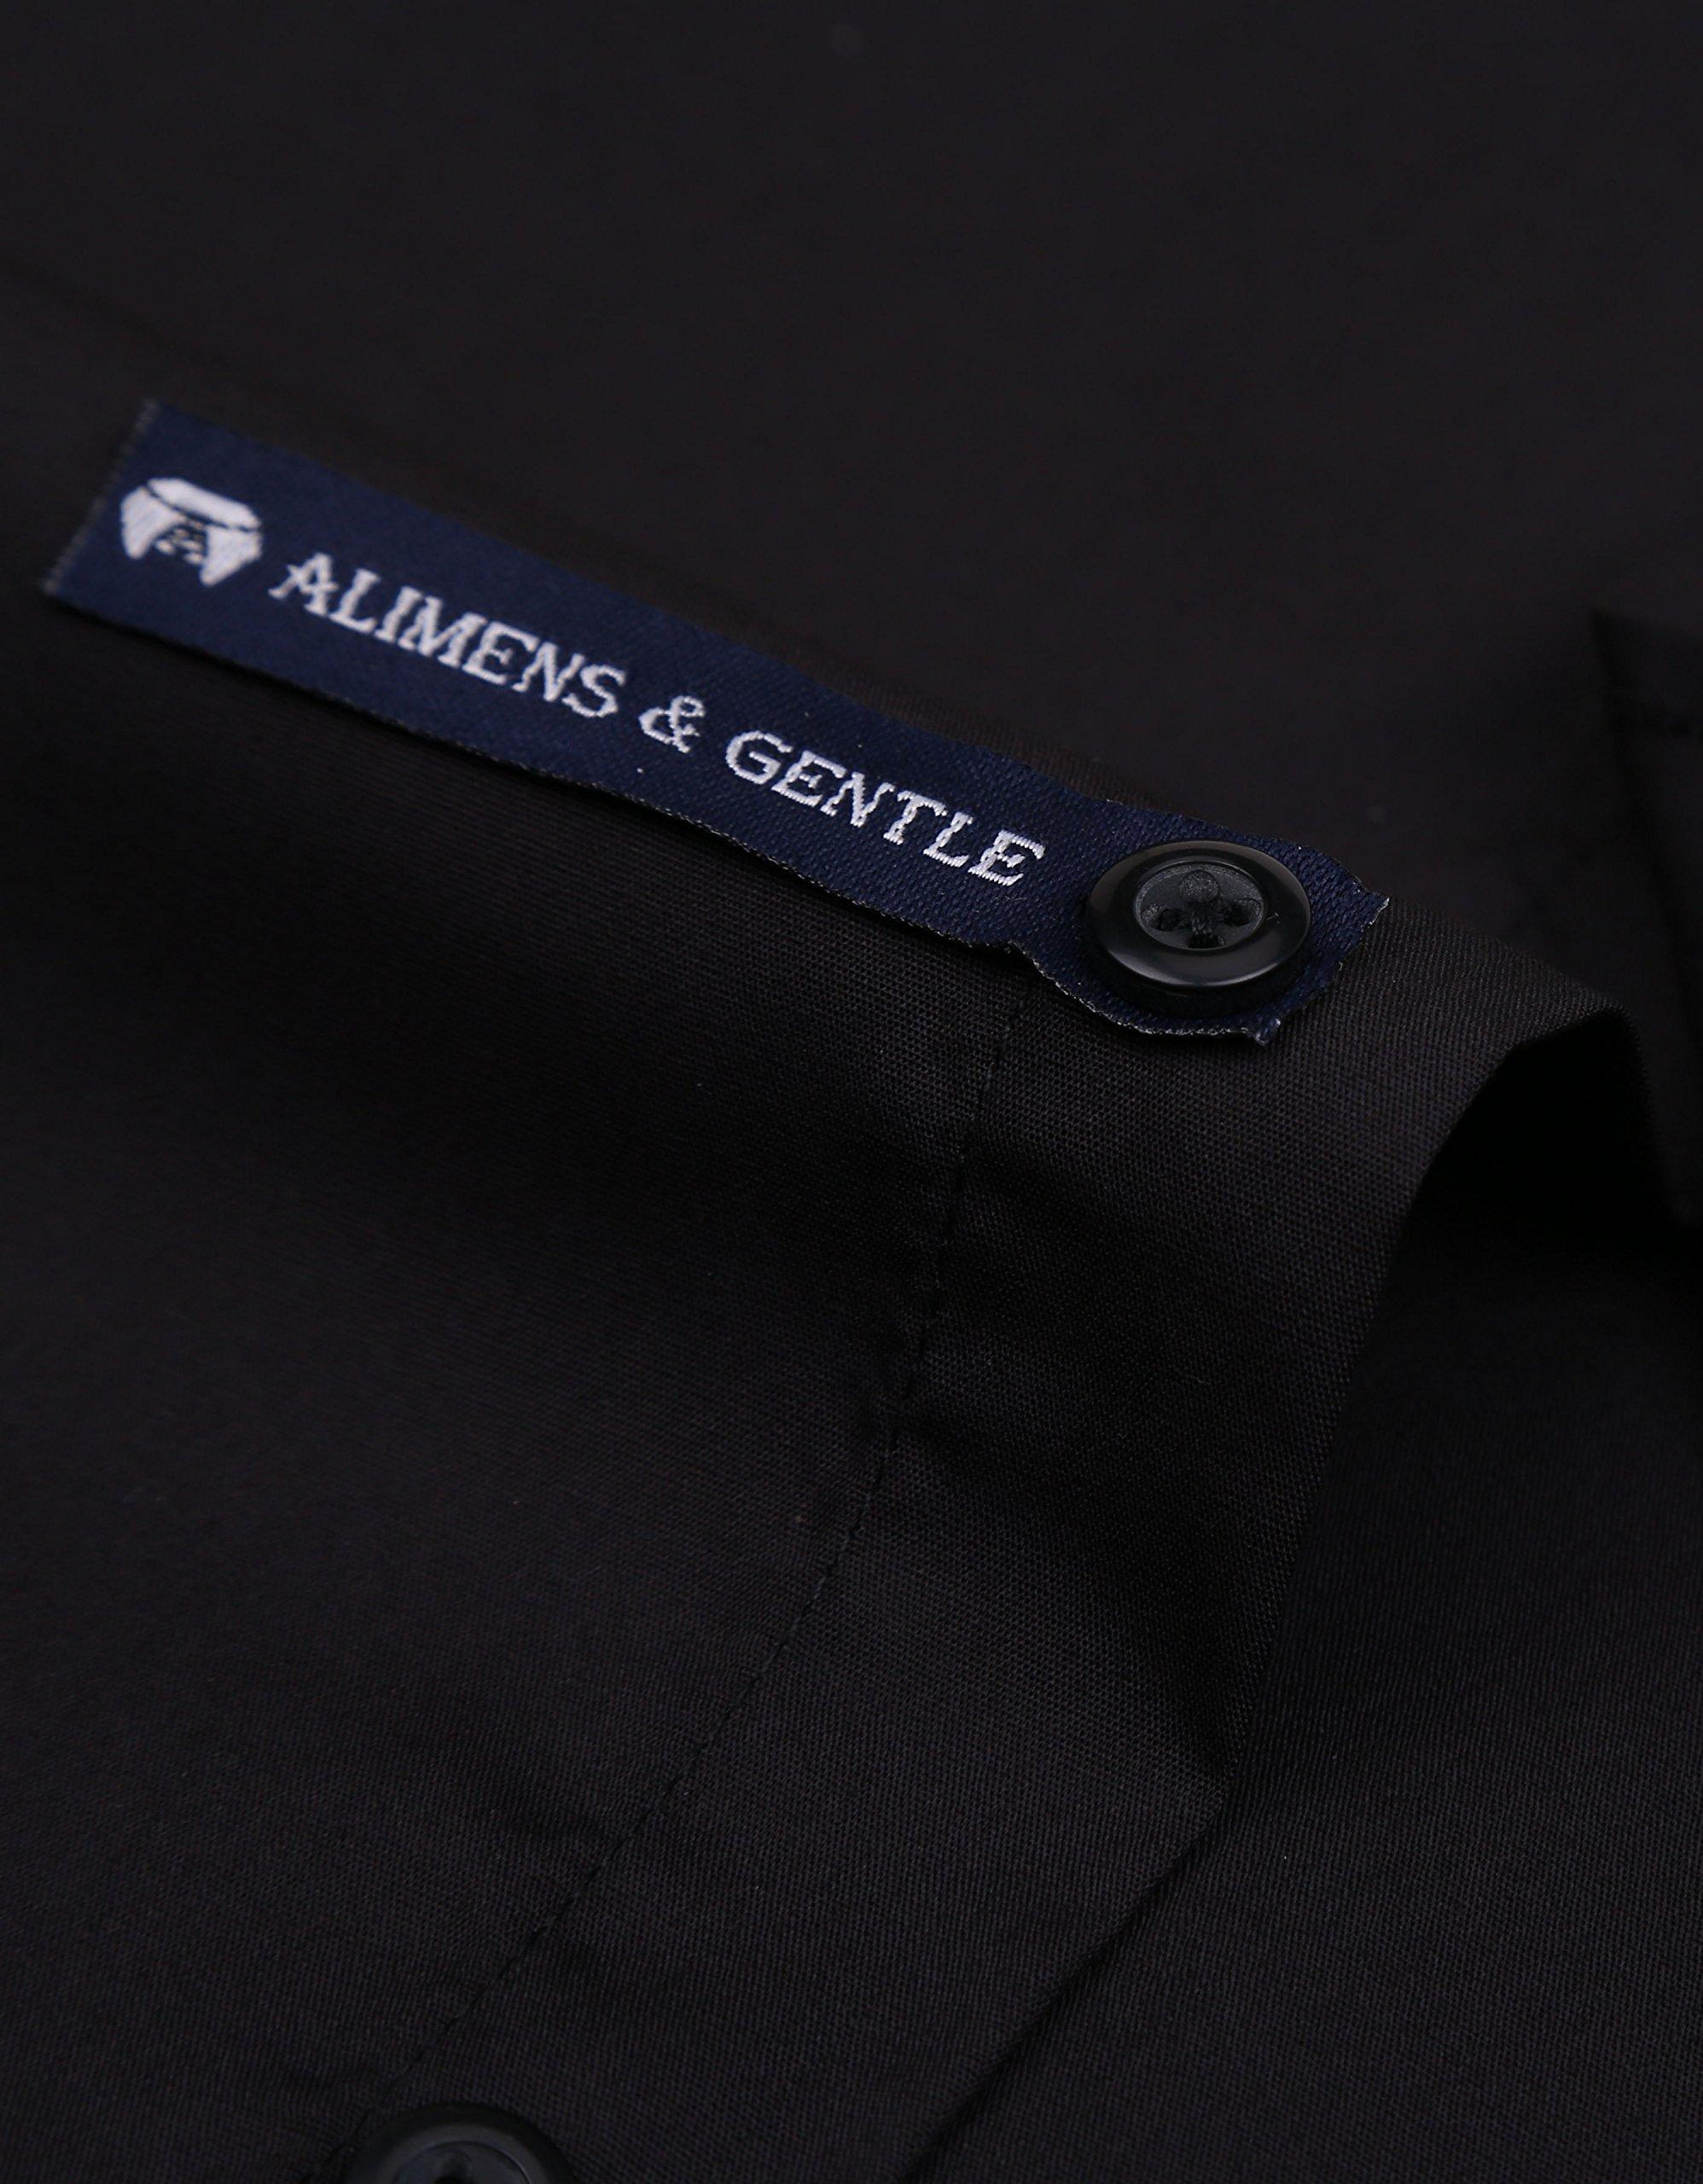 336099710e9 Alimens   Gentle French Cuff Regular Fit Dress Shirts (Cufflink Included)  (16.5